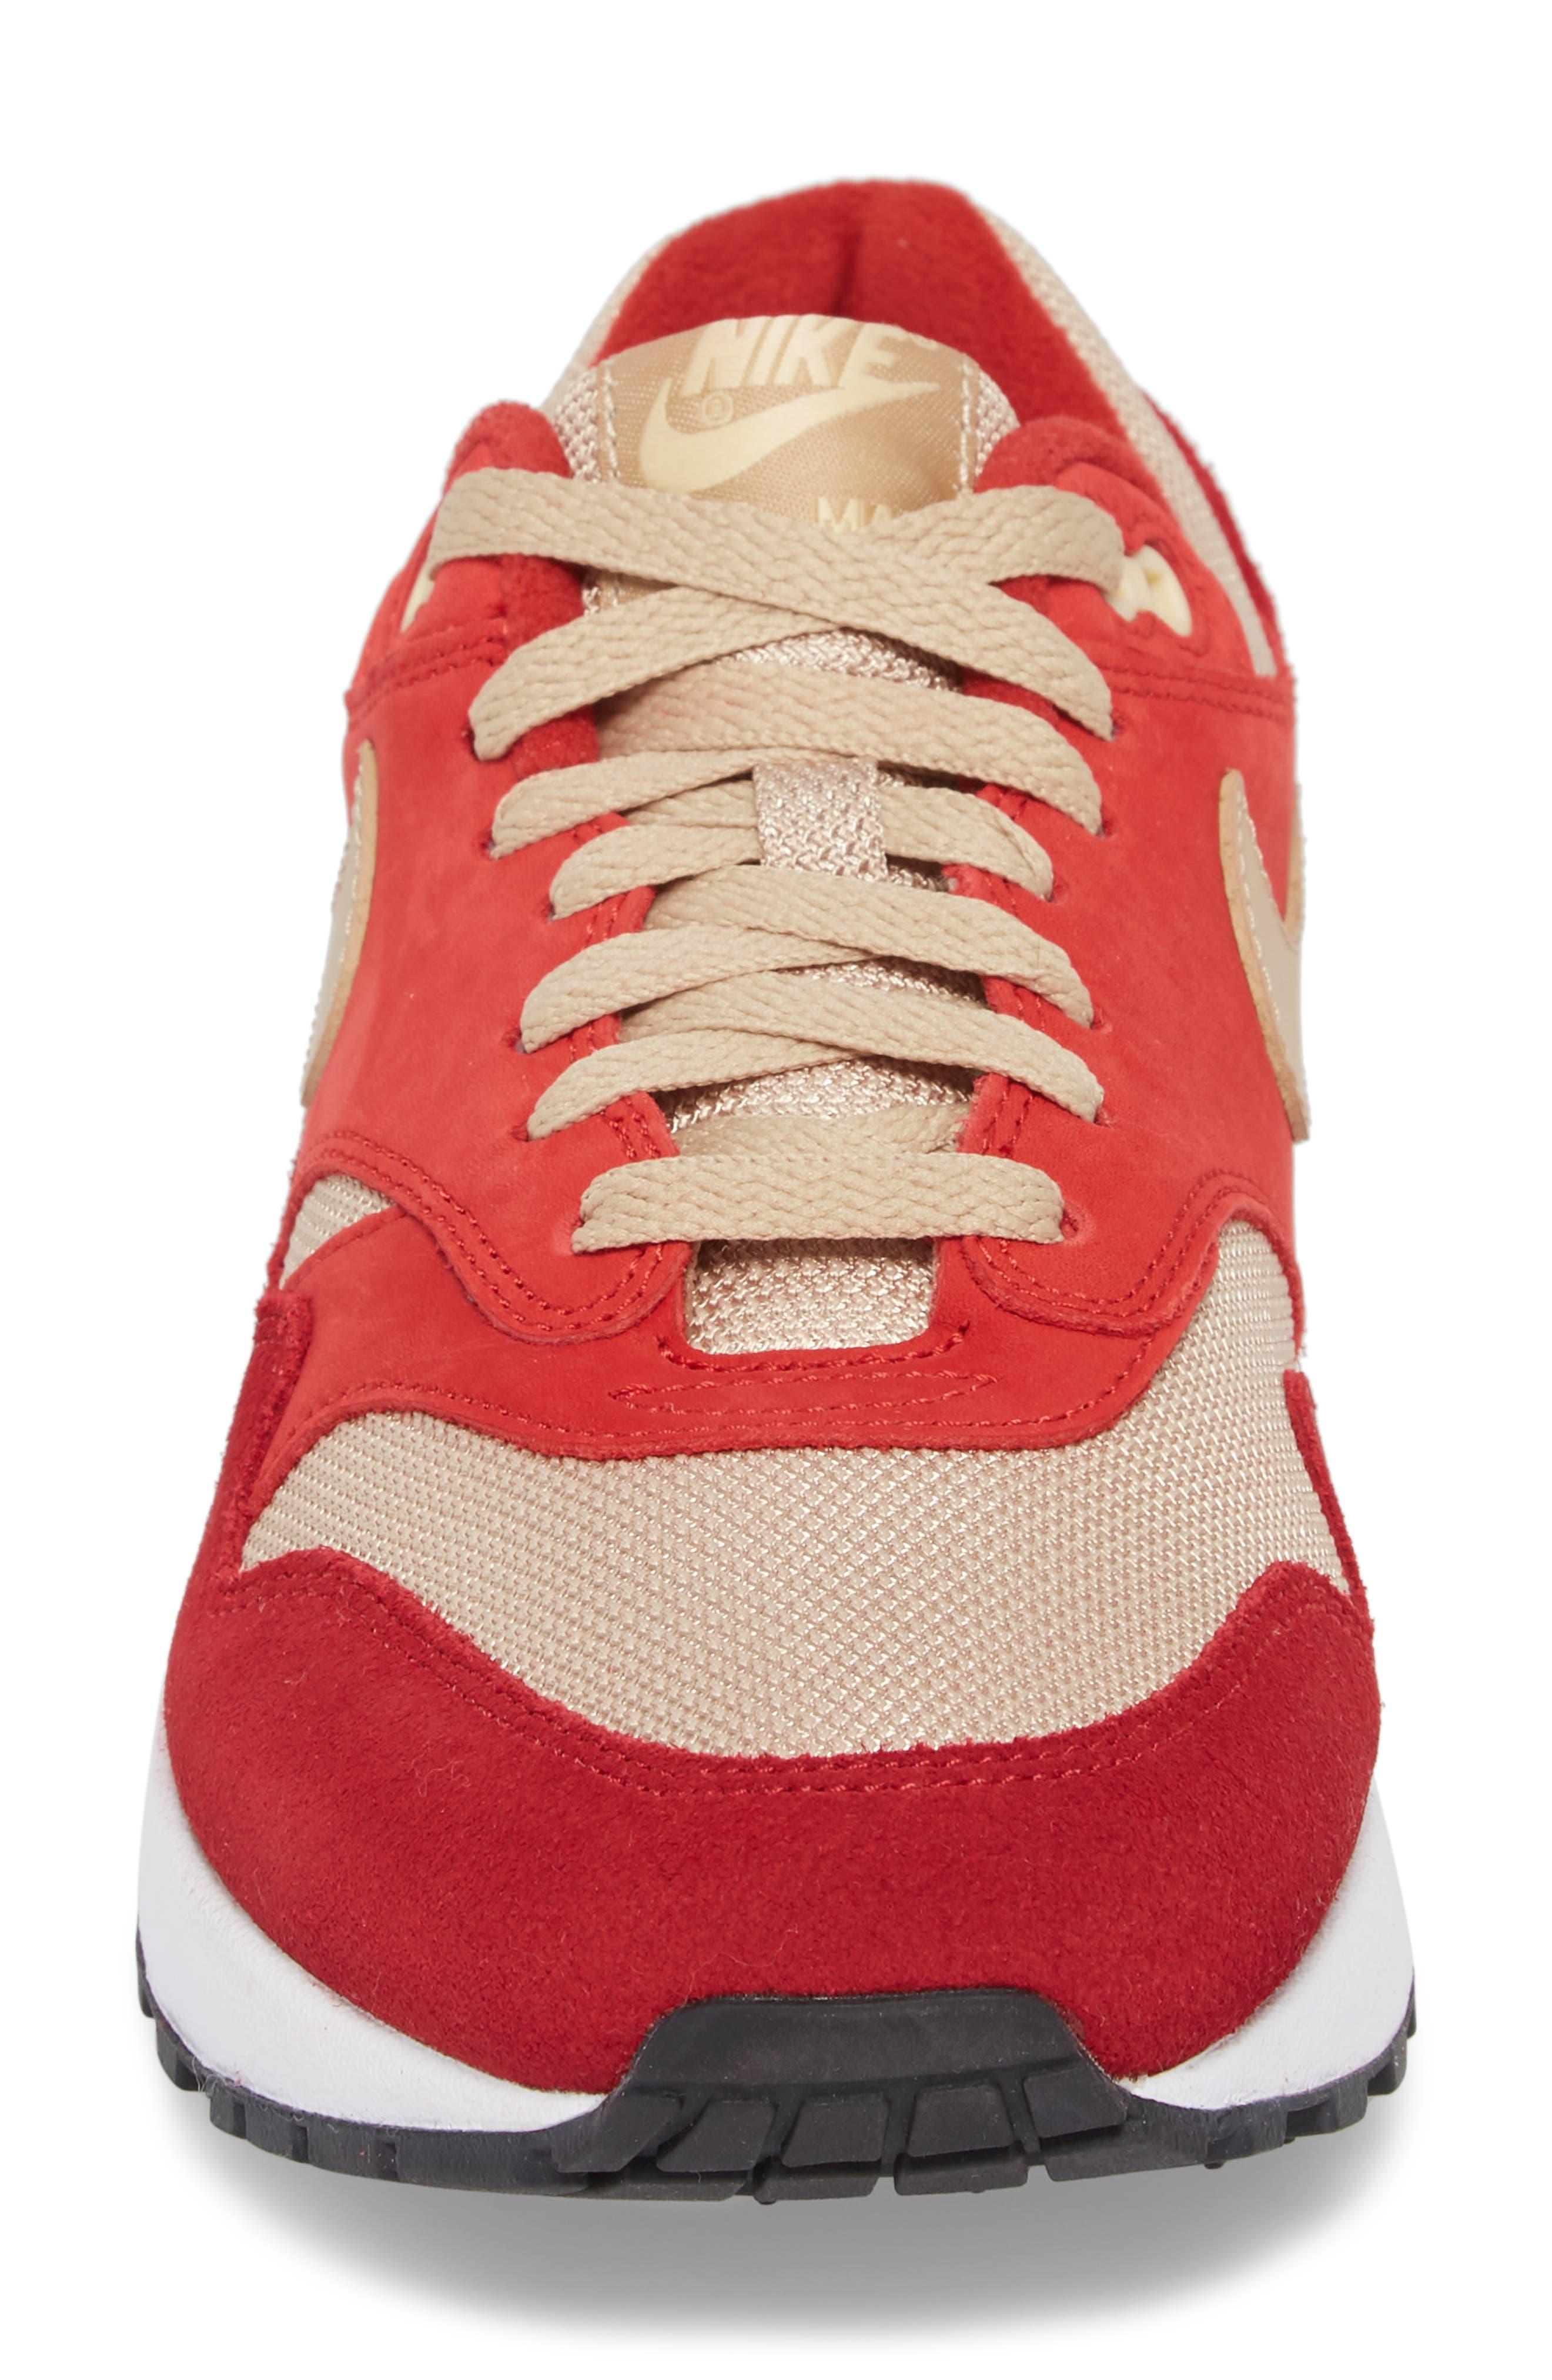 Air Max 1 Premium Retro Sneaker,                             Alternate thumbnail 4, color,                             Red/ Mushroom-Red-Vanilla